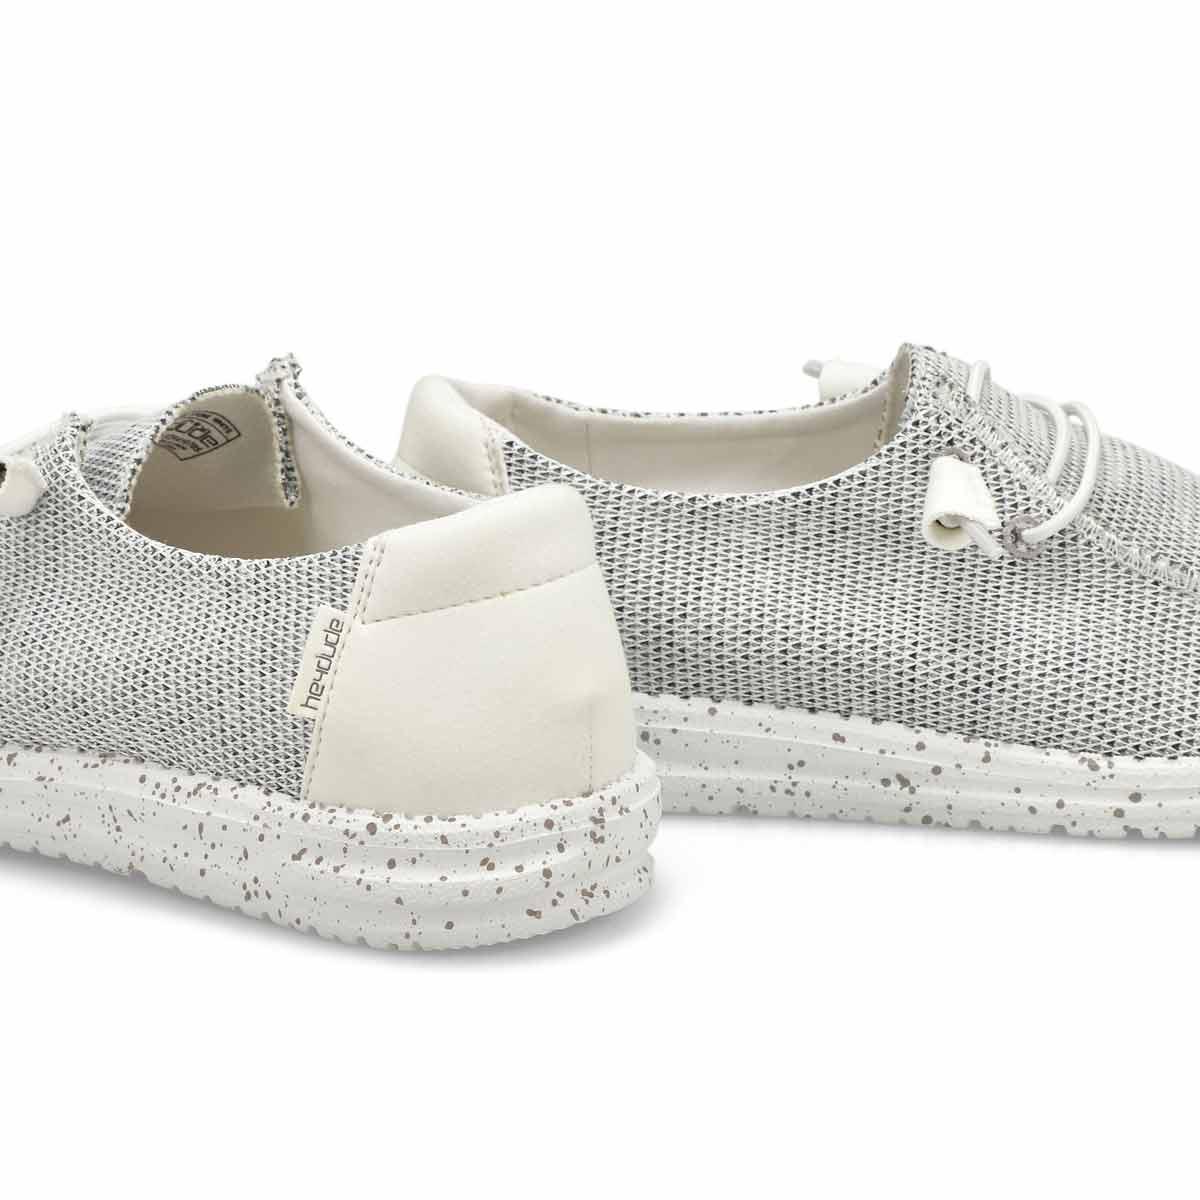 Chaussures WENDY SOX pierre/blanc femmes